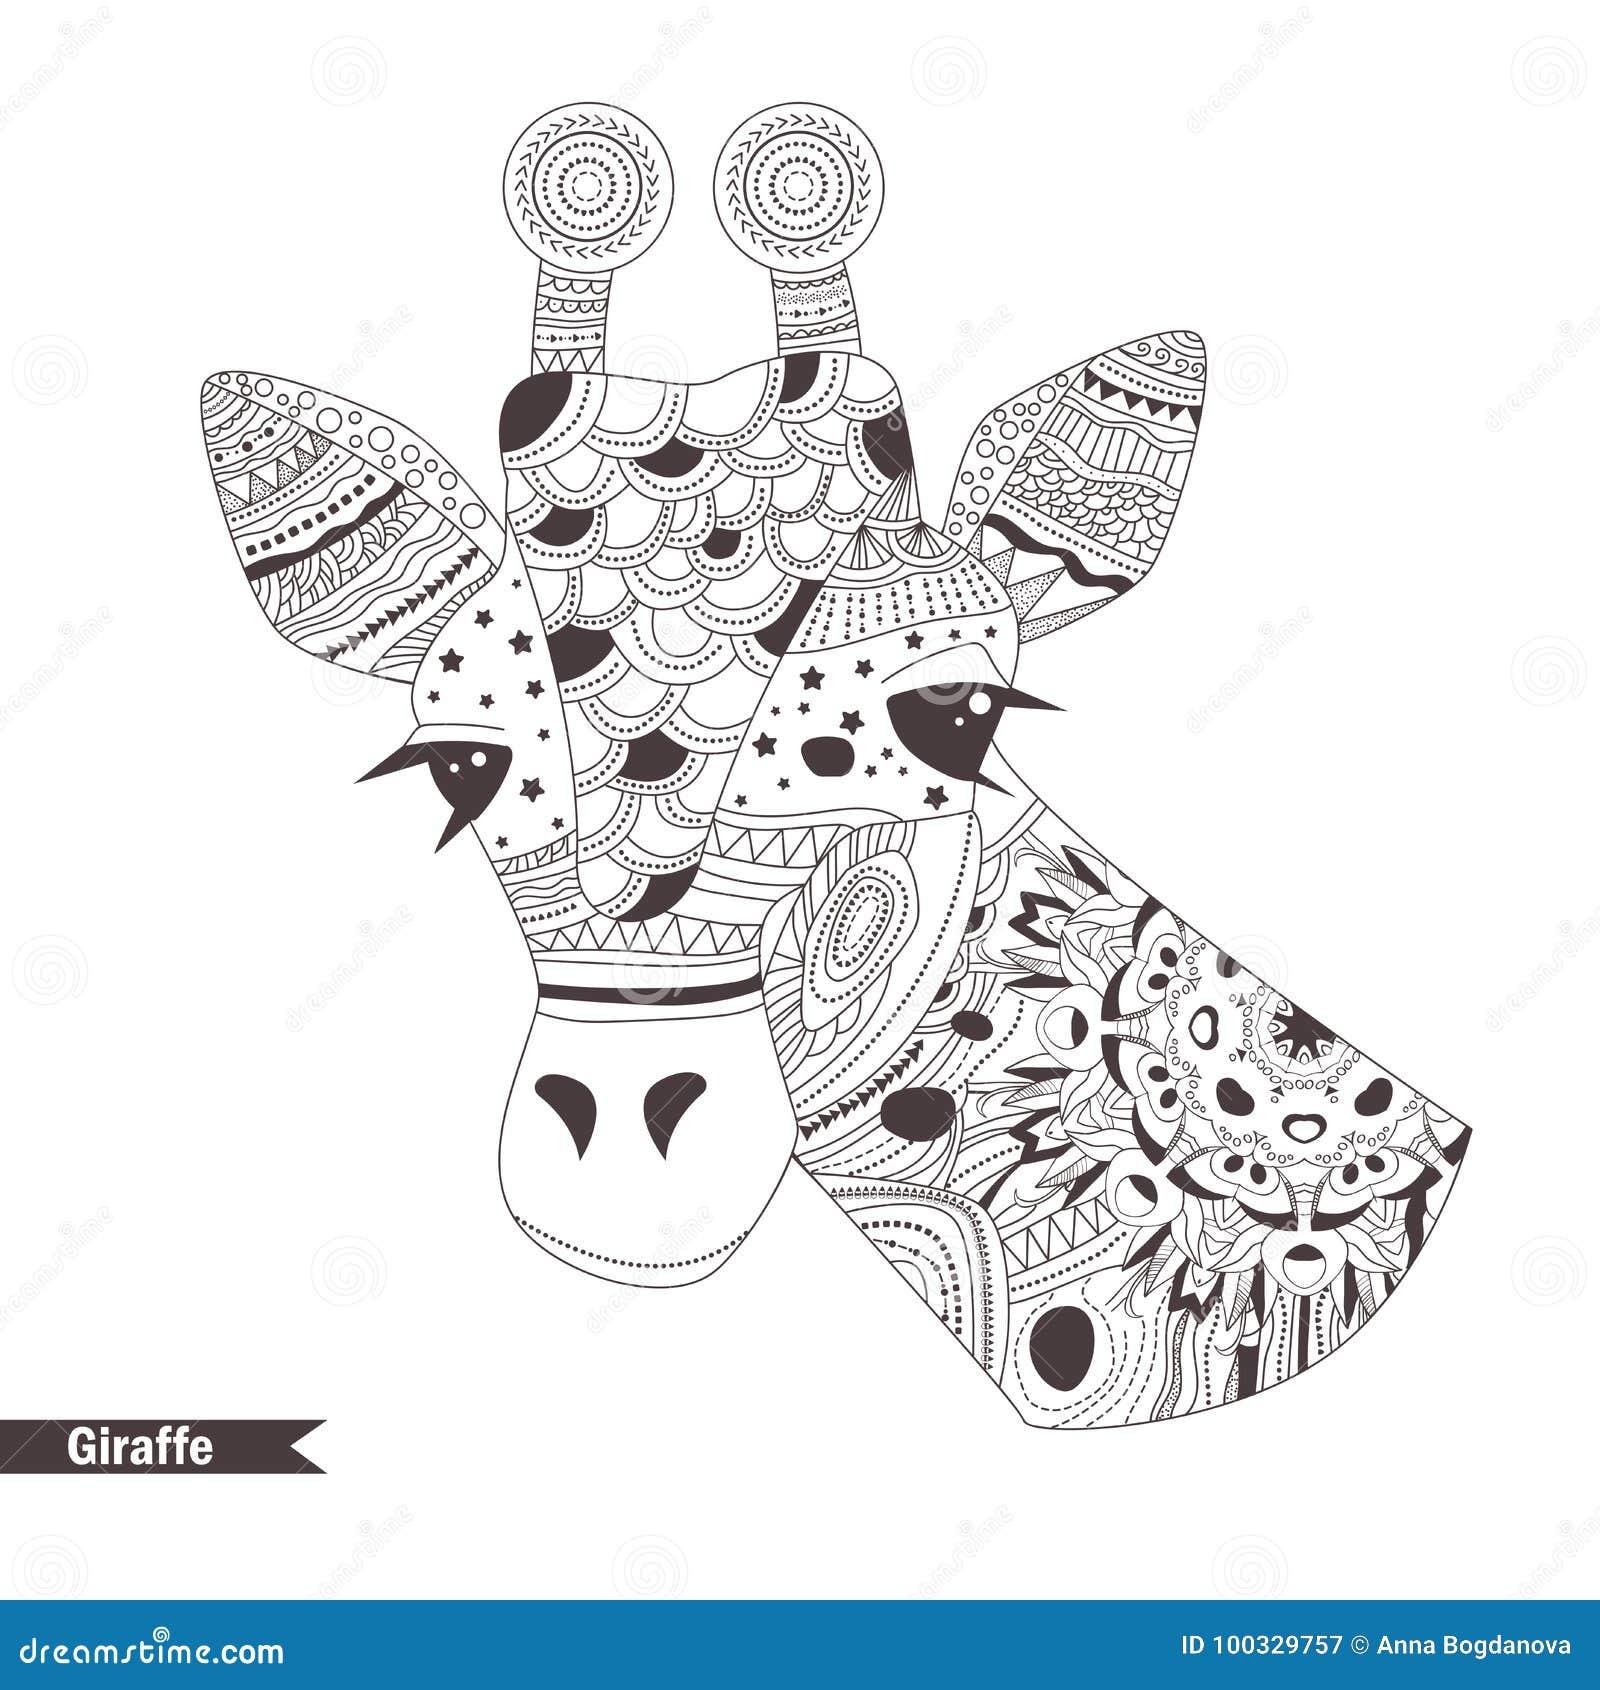 Coloriage Girafe Mandala.Girafe Livre De Coloration Illustration De Vecteur